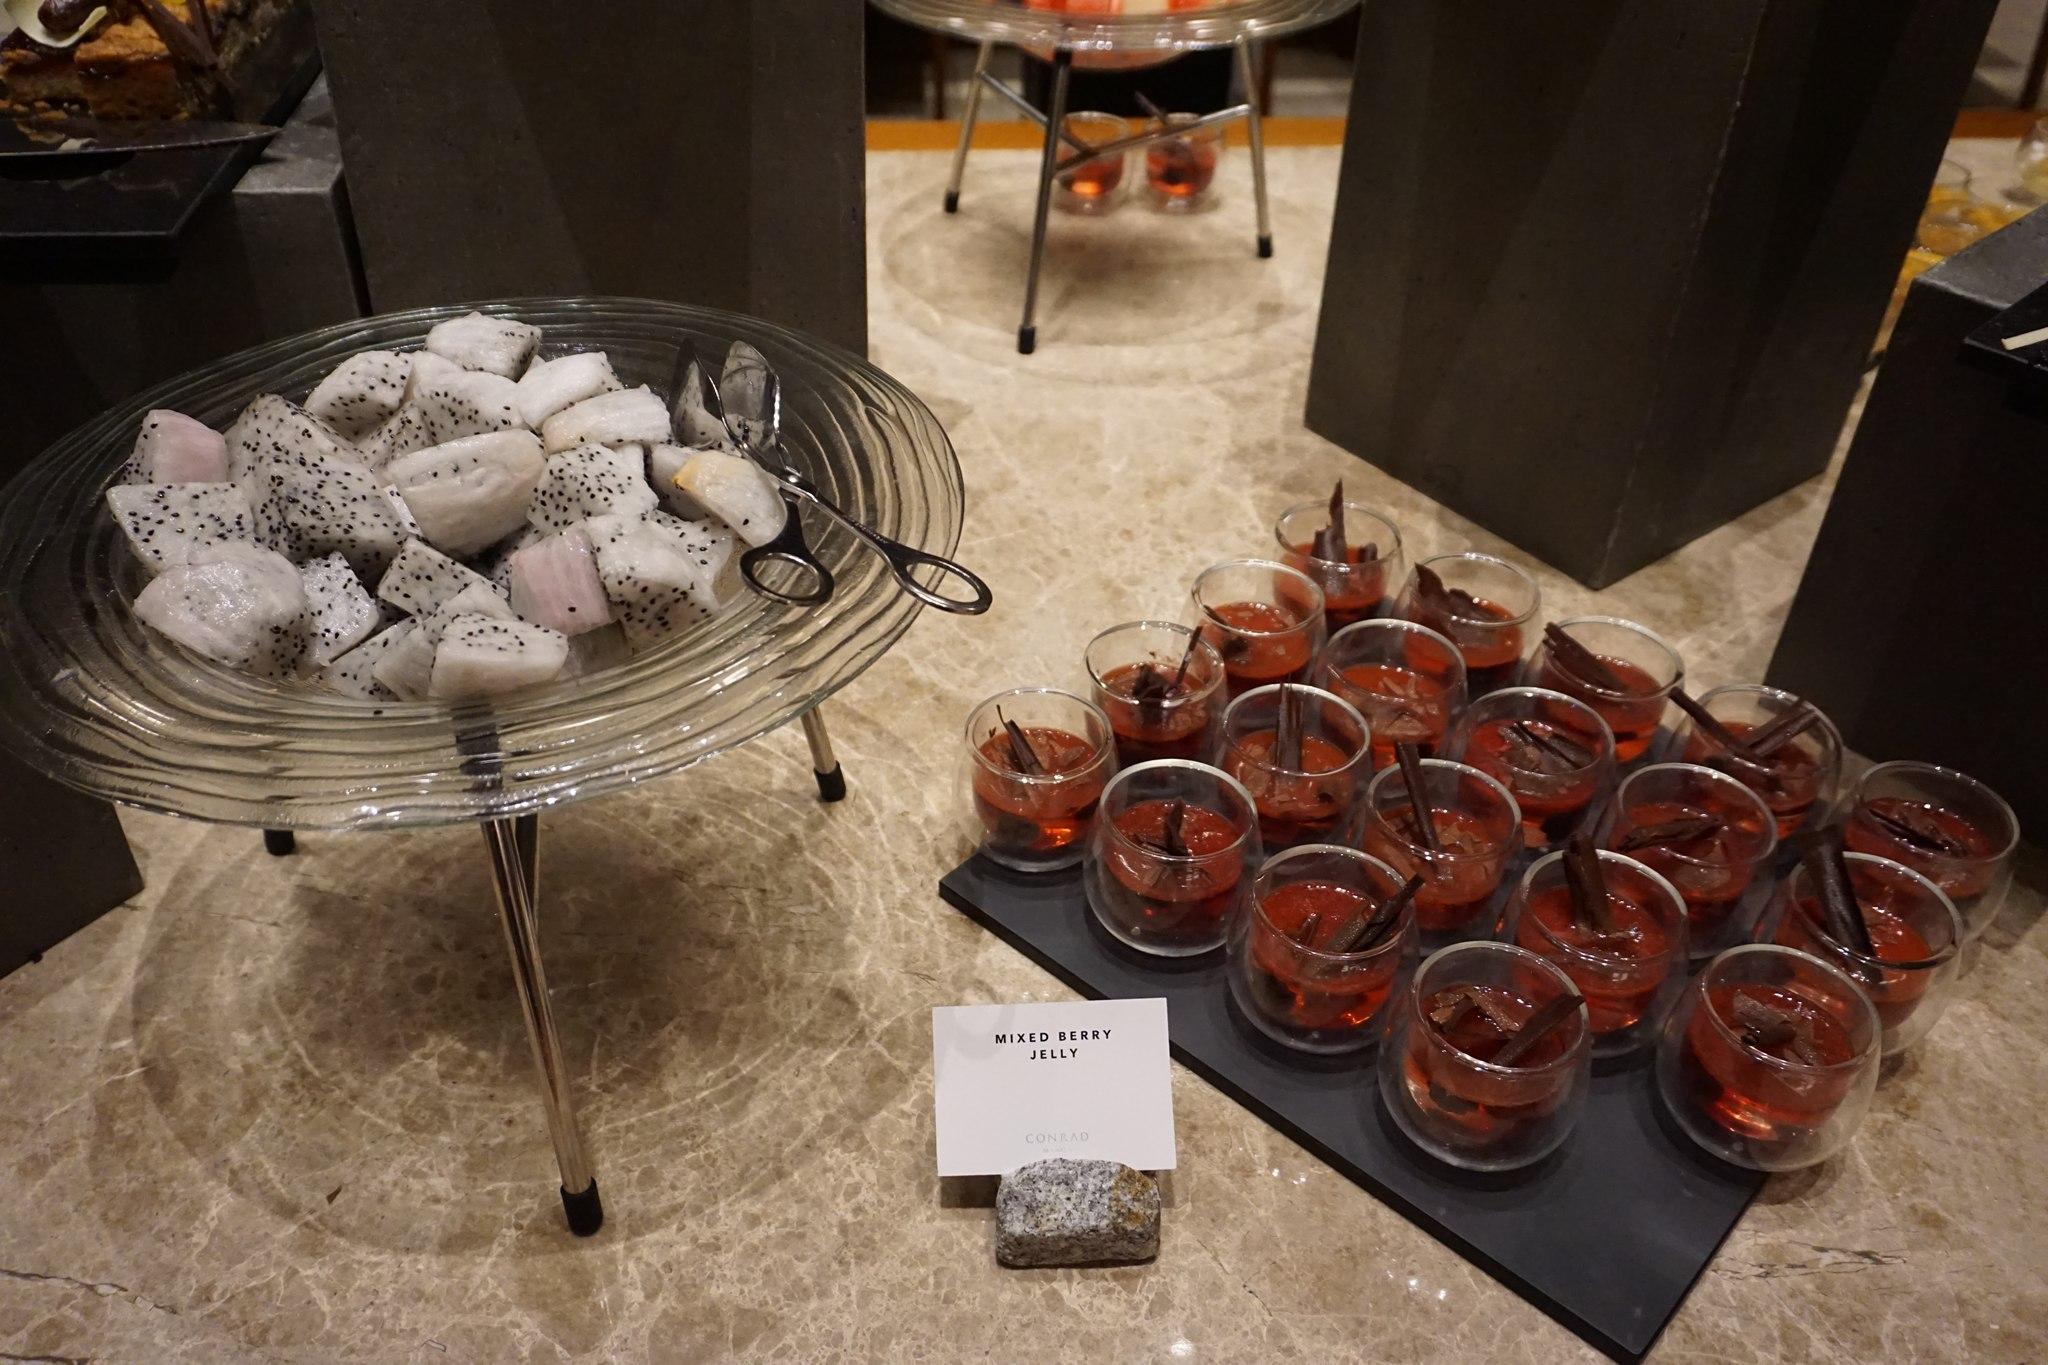 desserts-at-conrad-manila-brasserie-on-3-2